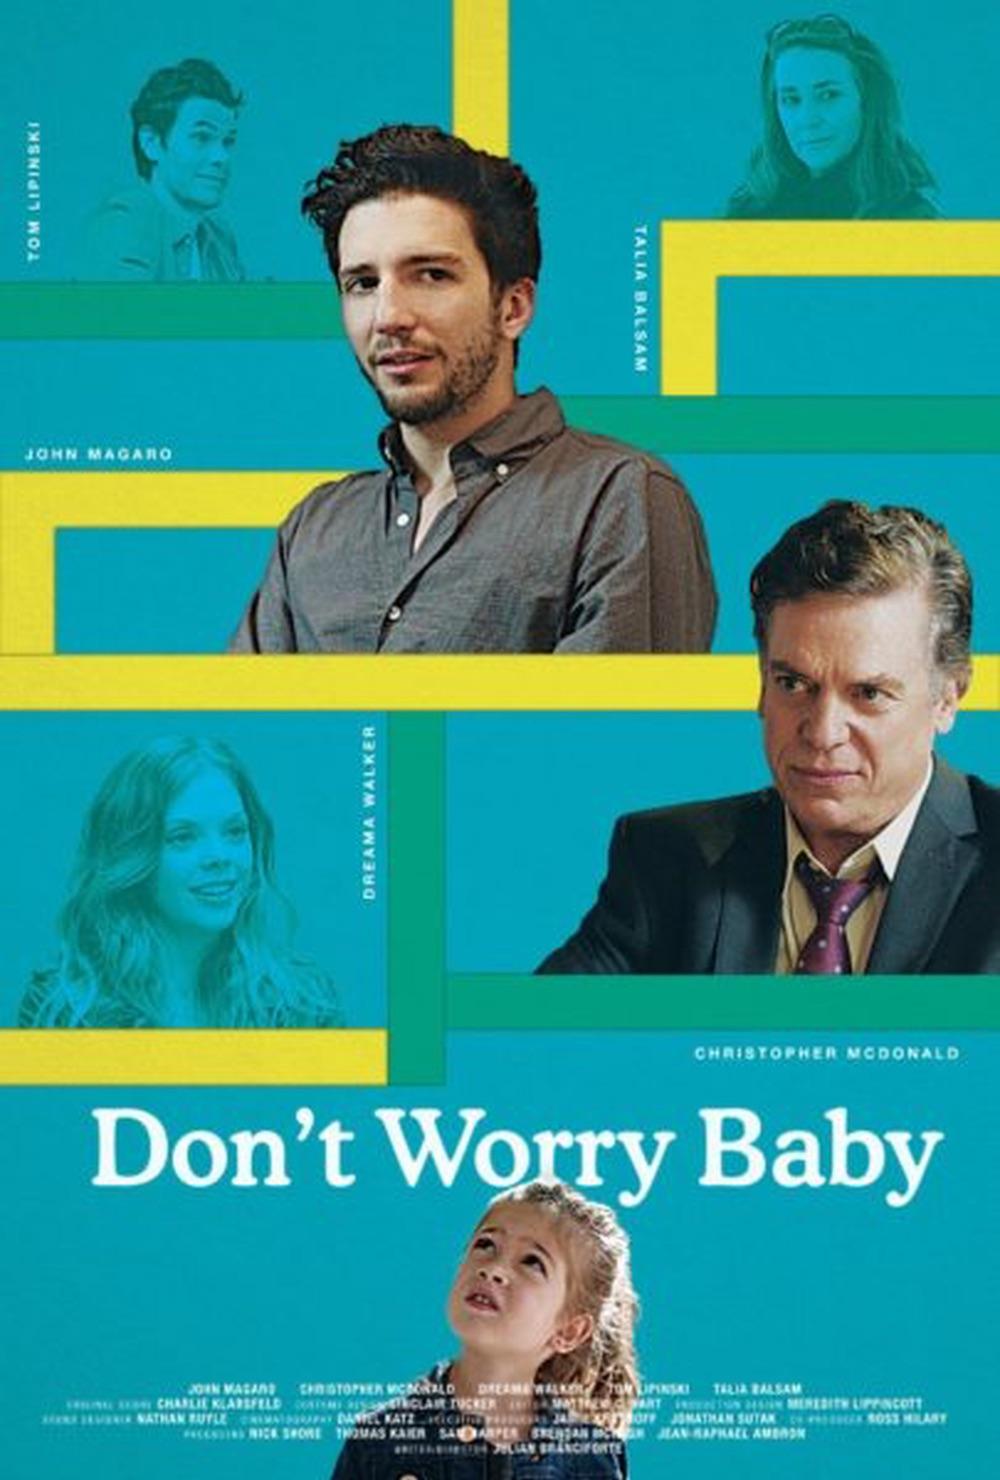 Dont-Worry-Baby-Movie-Posterjpg-405x600.jpg